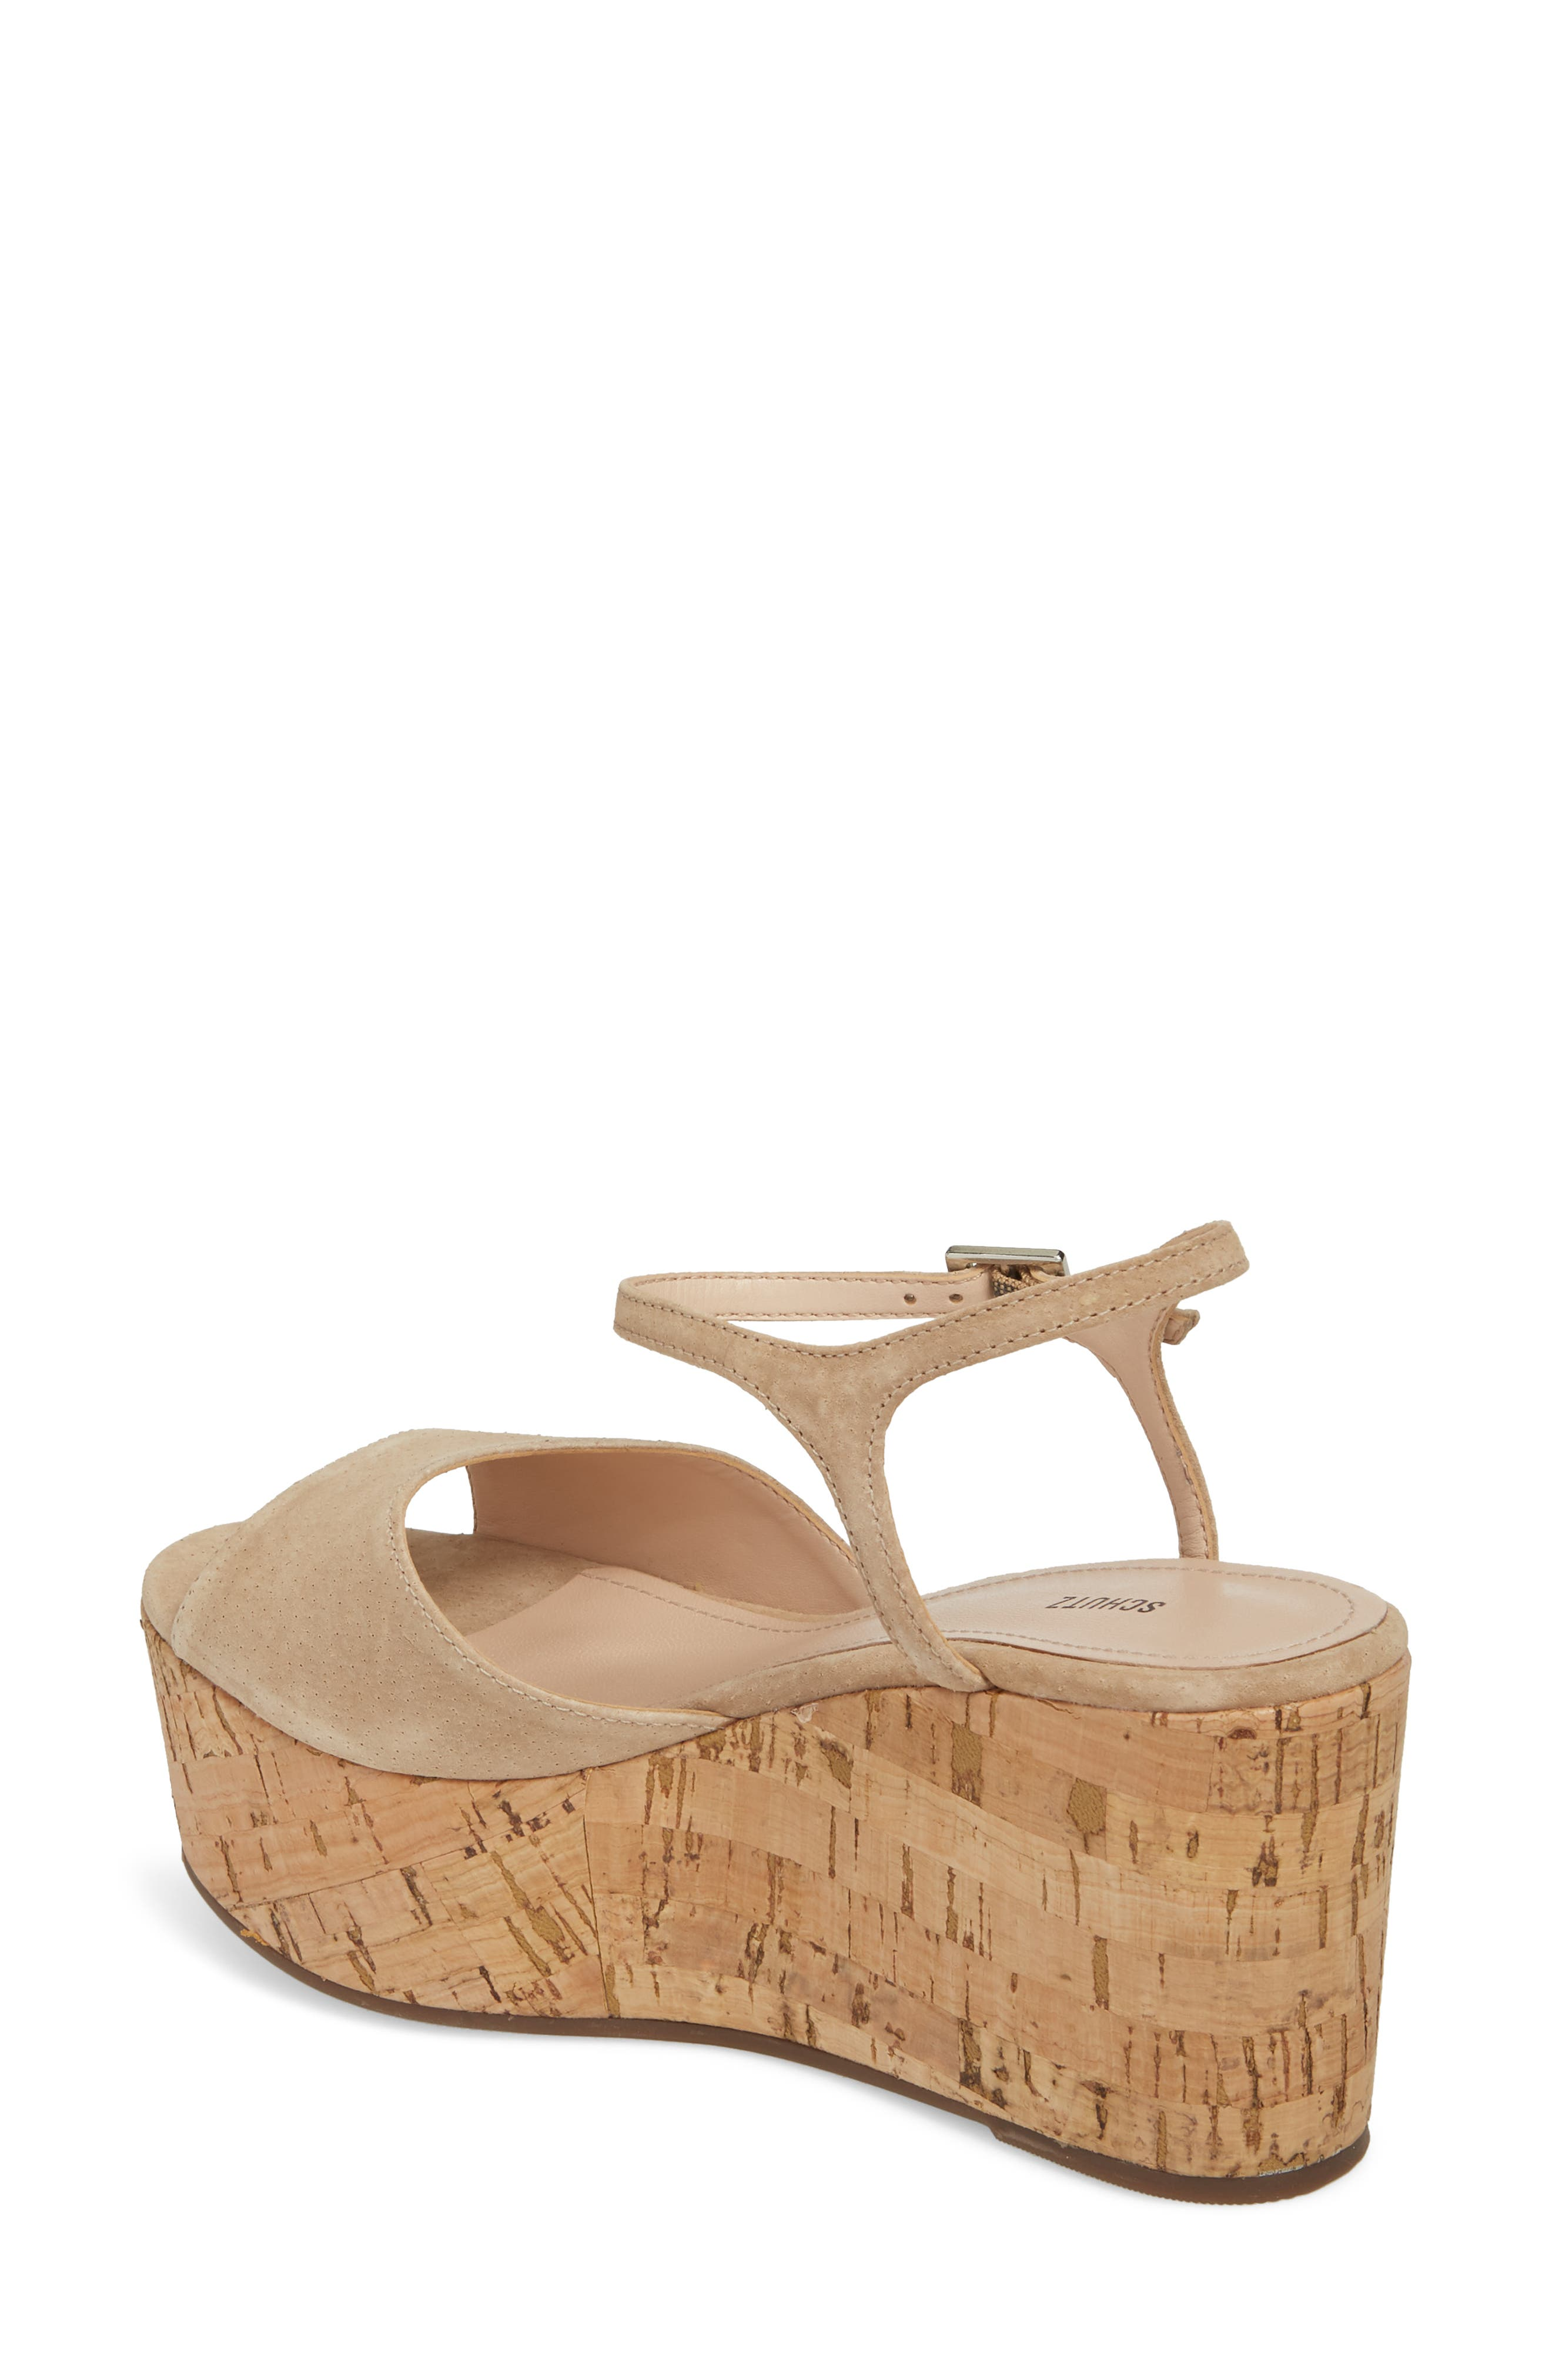 Heloise Platform Wedge Sandal,                             Alternate thumbnail 2, color,                             250